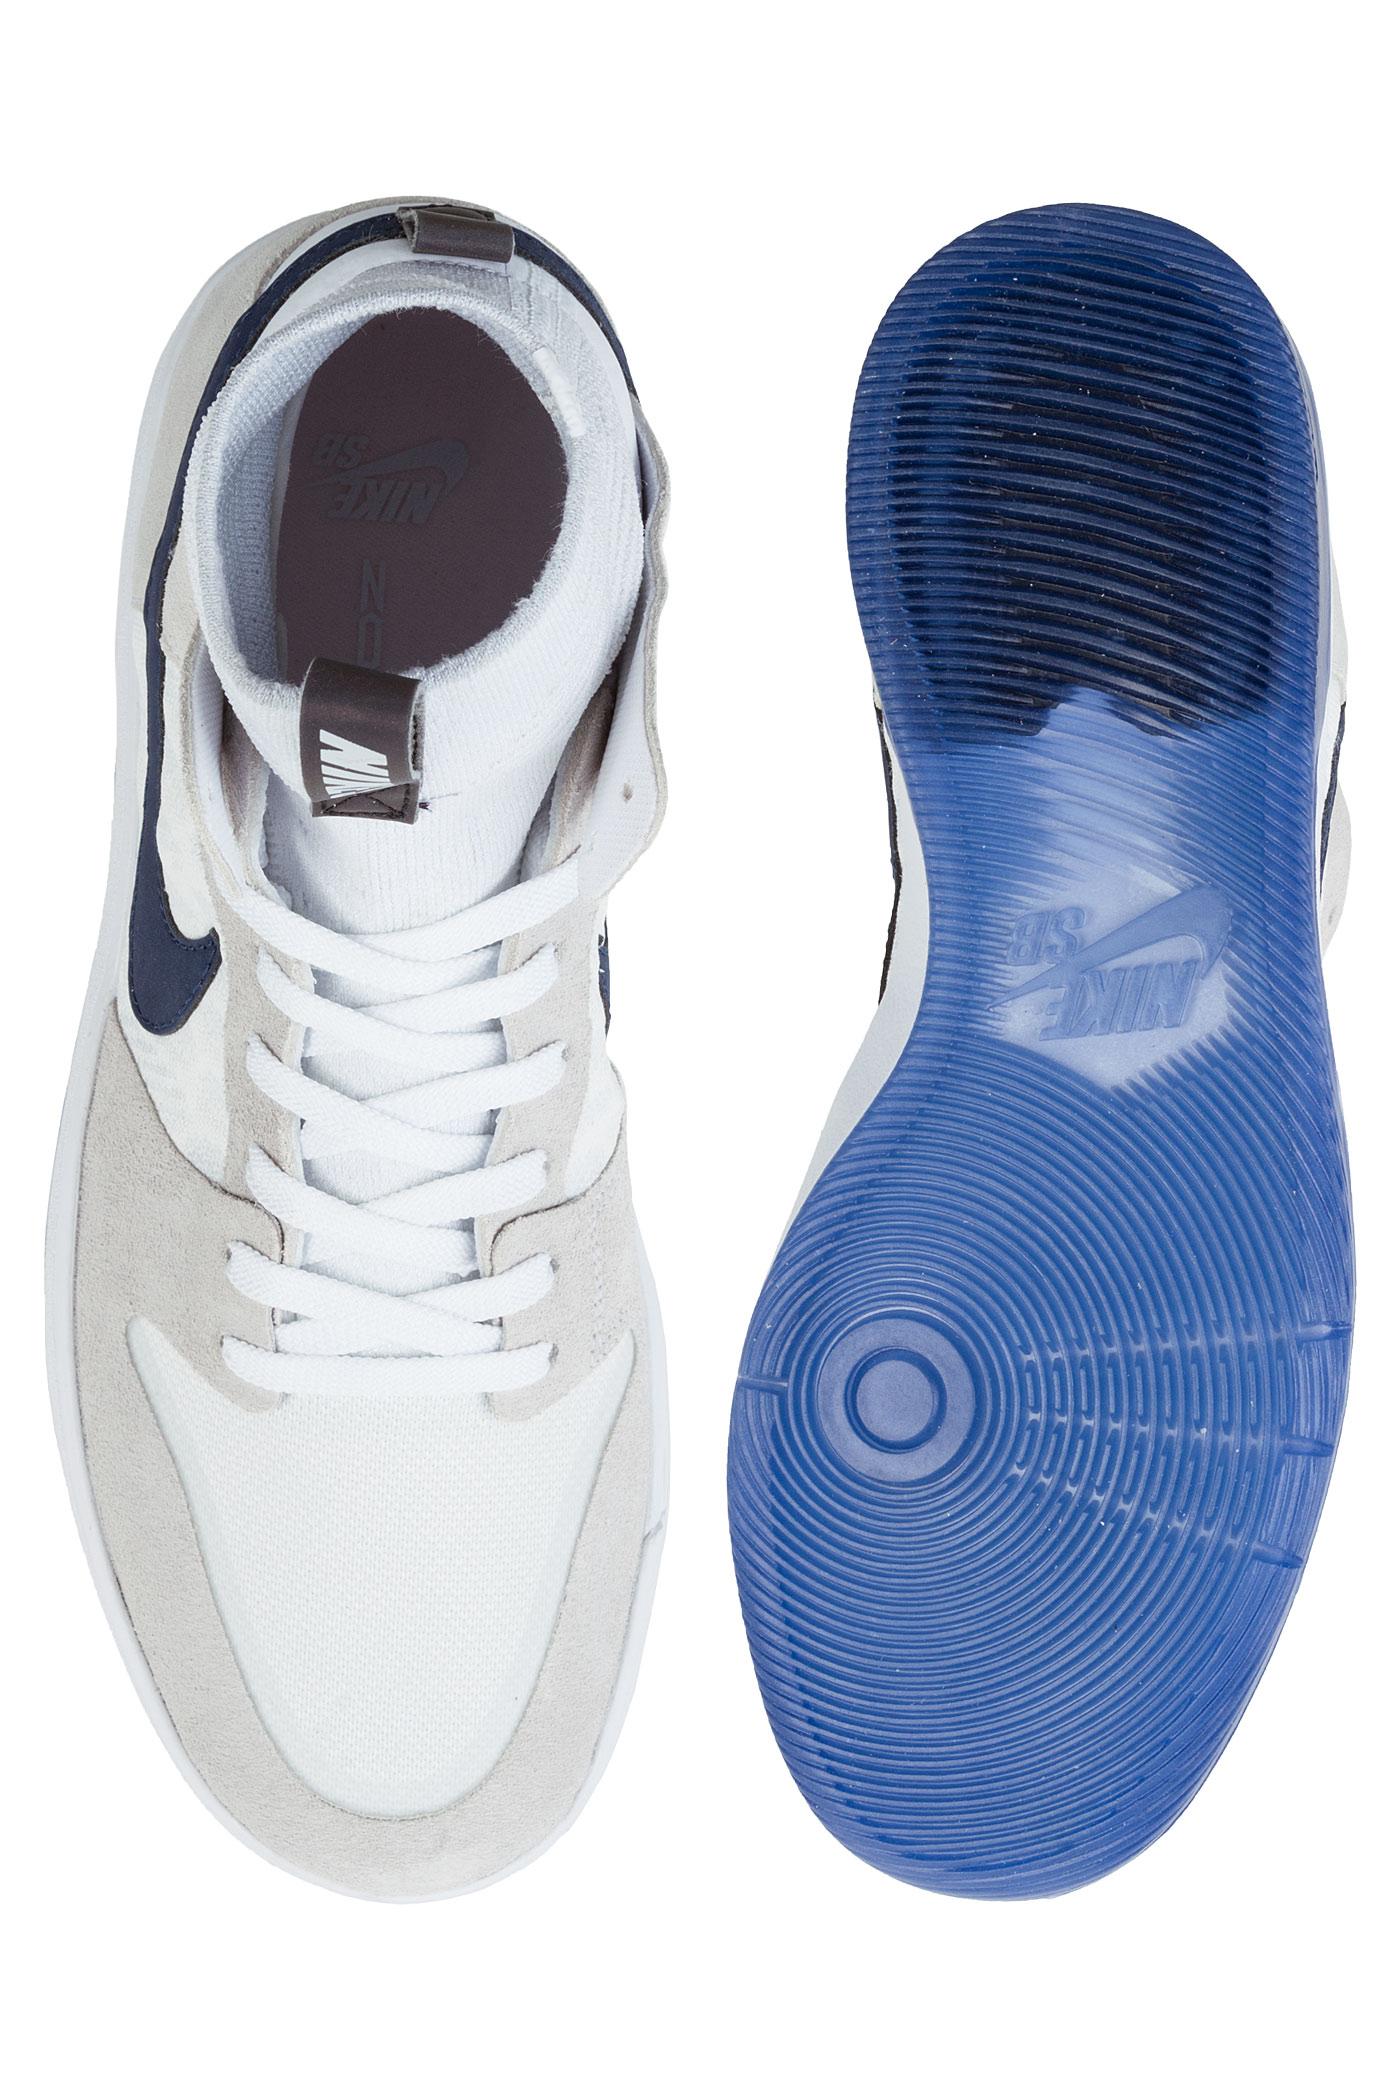 timeless design f9a28 3f005 Nike SB Dunk High Elite Cyrus Bennett QS Shoes (white midnight navy ...